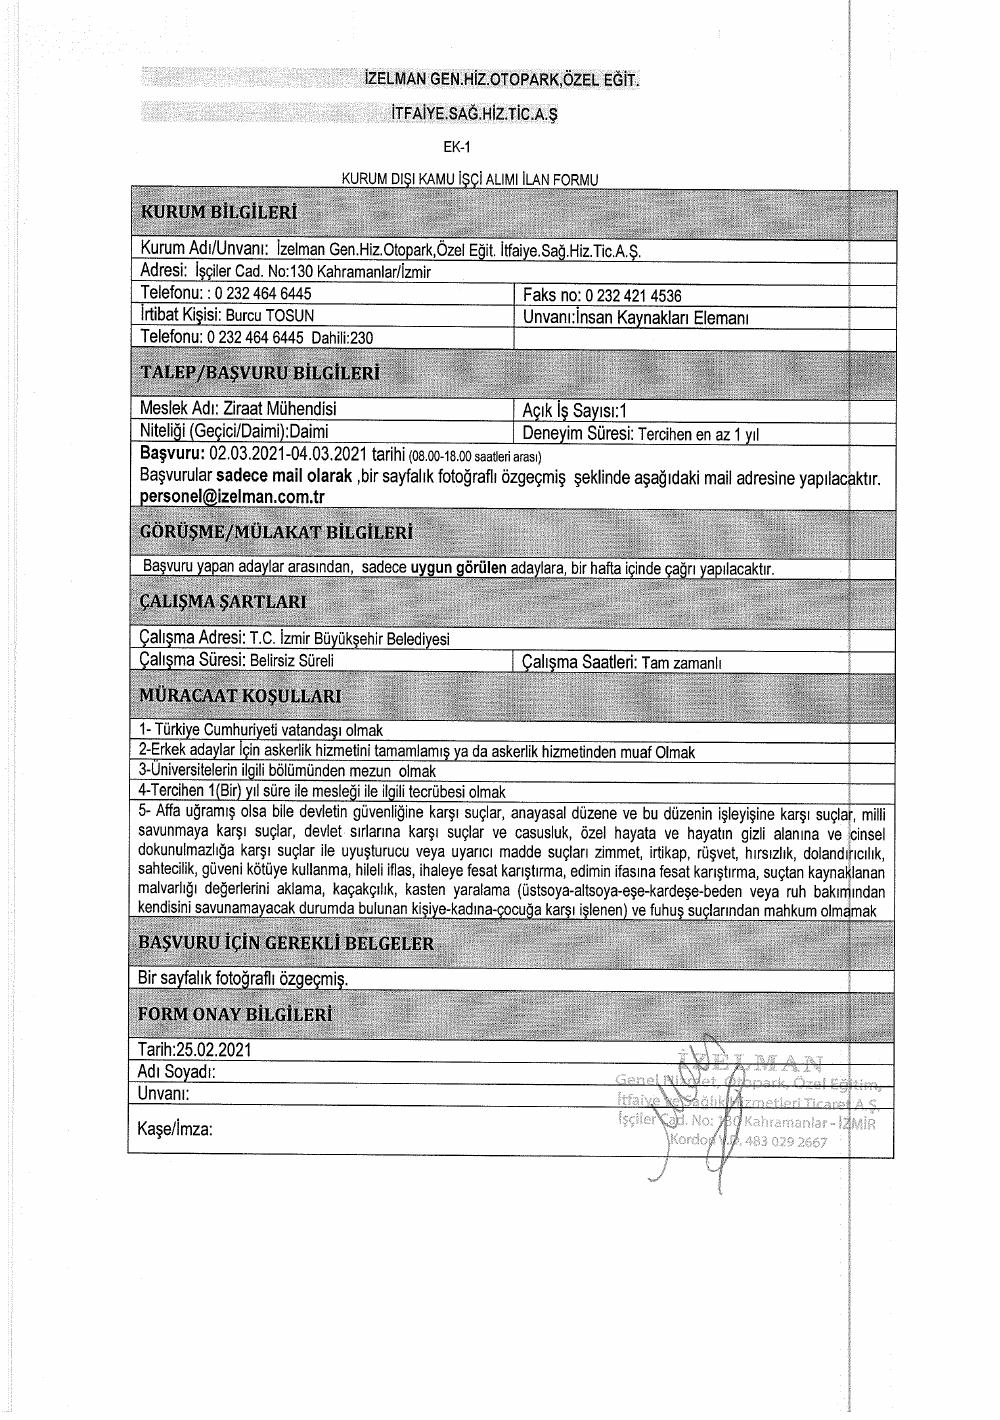 izmir-izelman-gen-hiz-tic-a-s-04-03-2021-000006.png